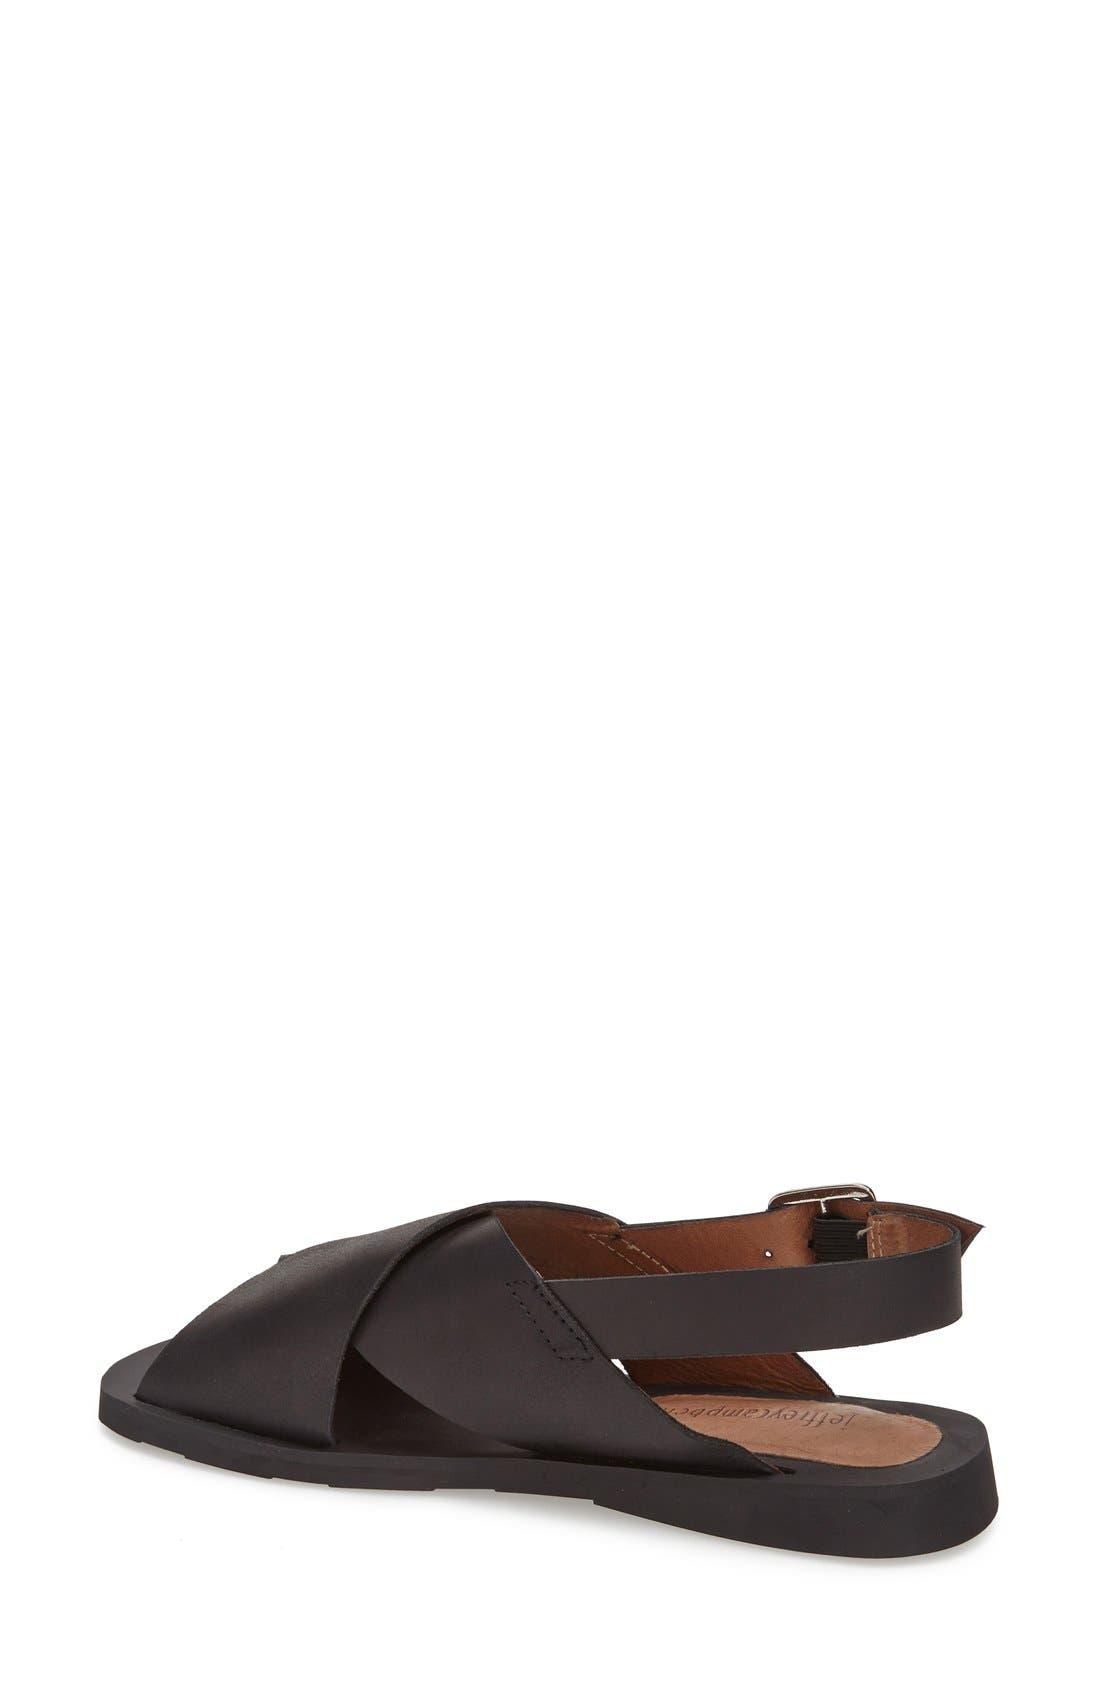 Alternate Image 2  - Jeffrey Campbell 'Maldives' Leather Sandal (Women)